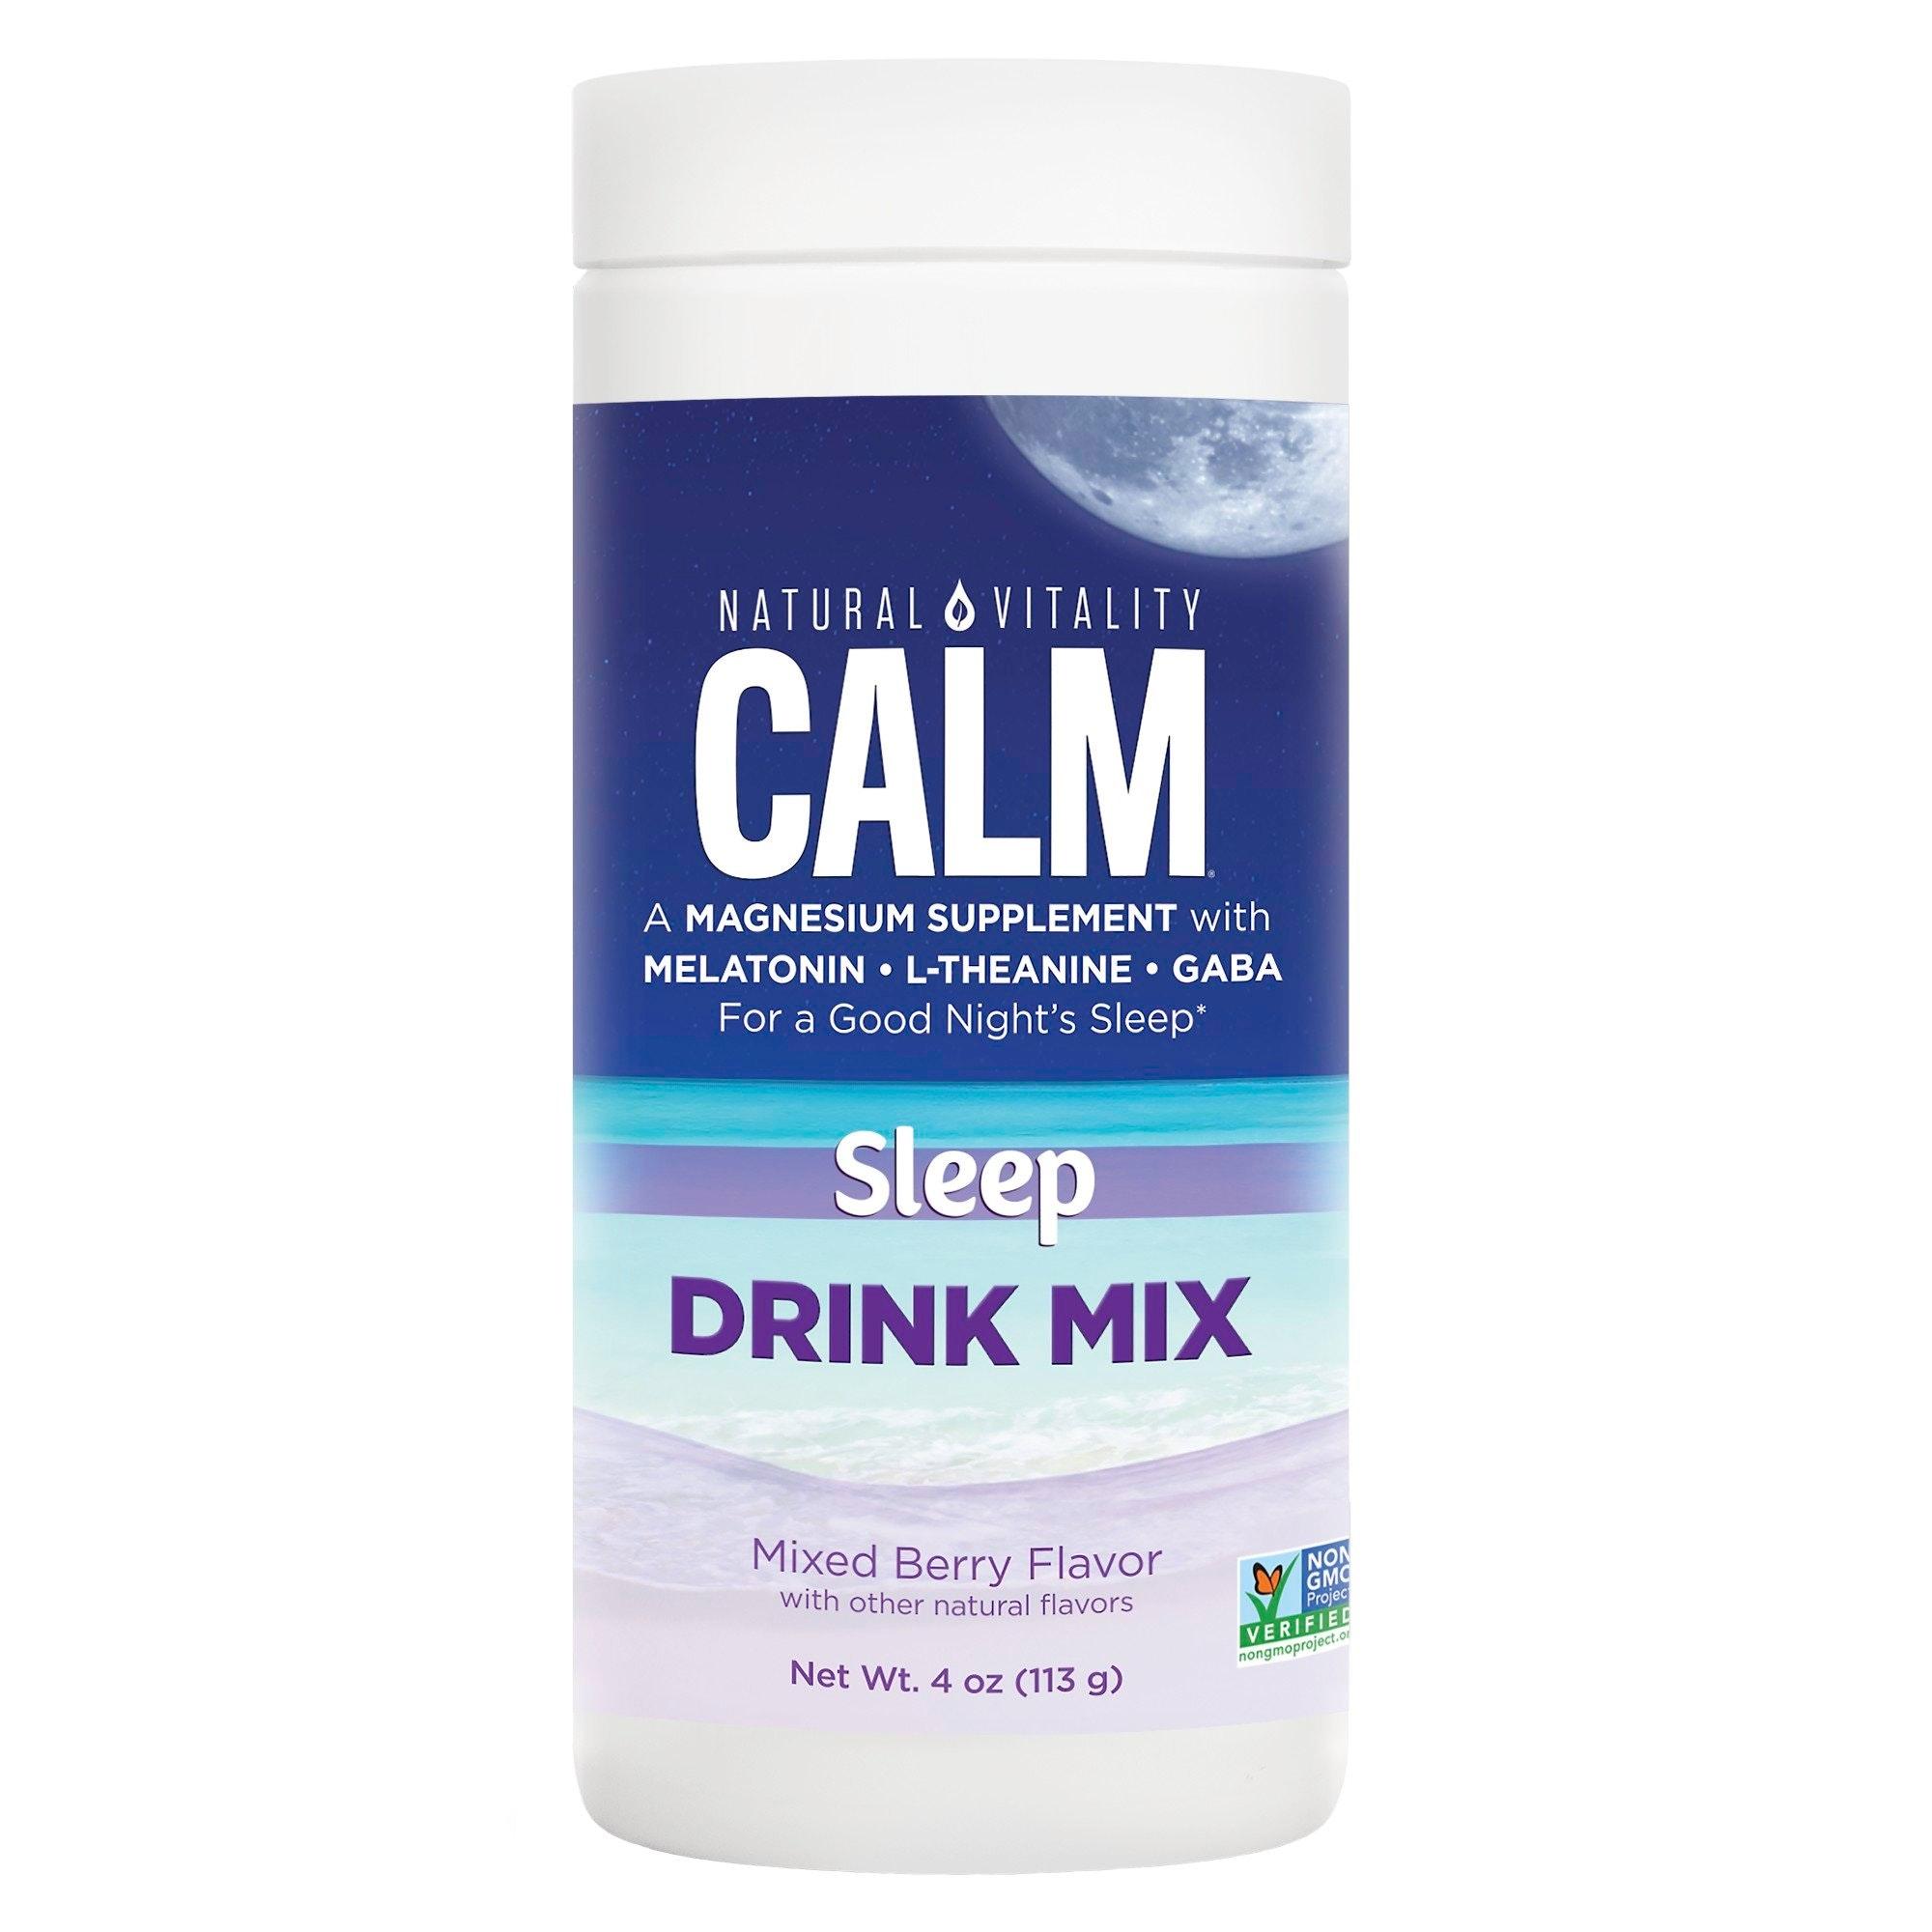 Natural Vitality Calm Sleep Drink Mix